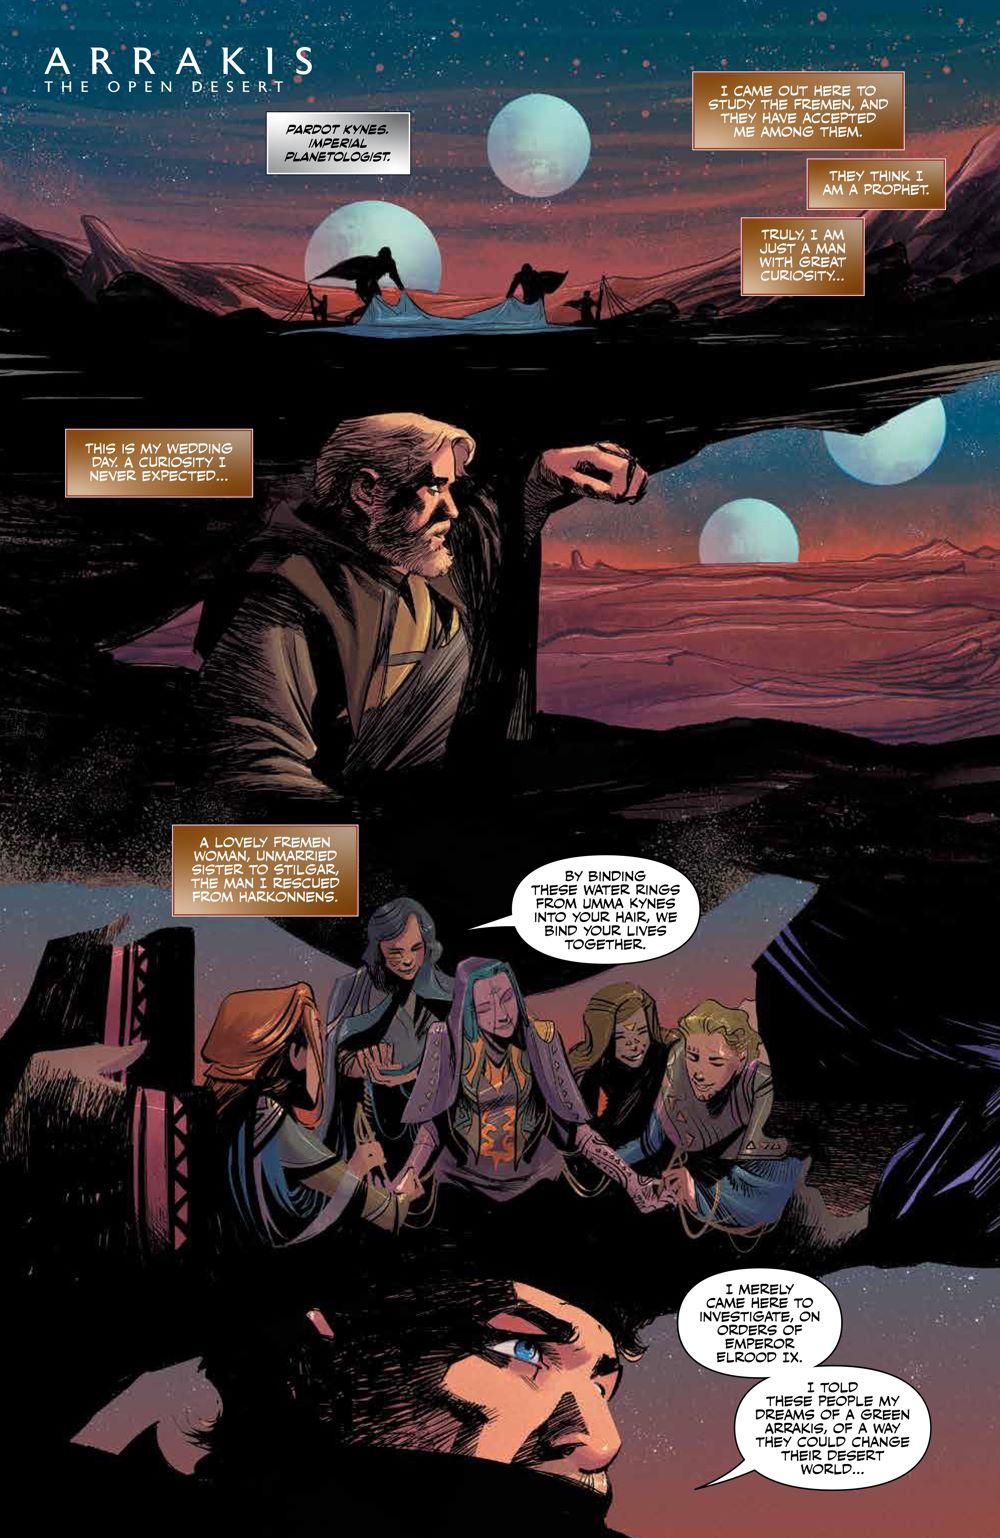 Dune_HouseAtreides_007_PRESS_3 ComicList Previews: DUNE HOUSE ATREIDES #7 (OF 12)